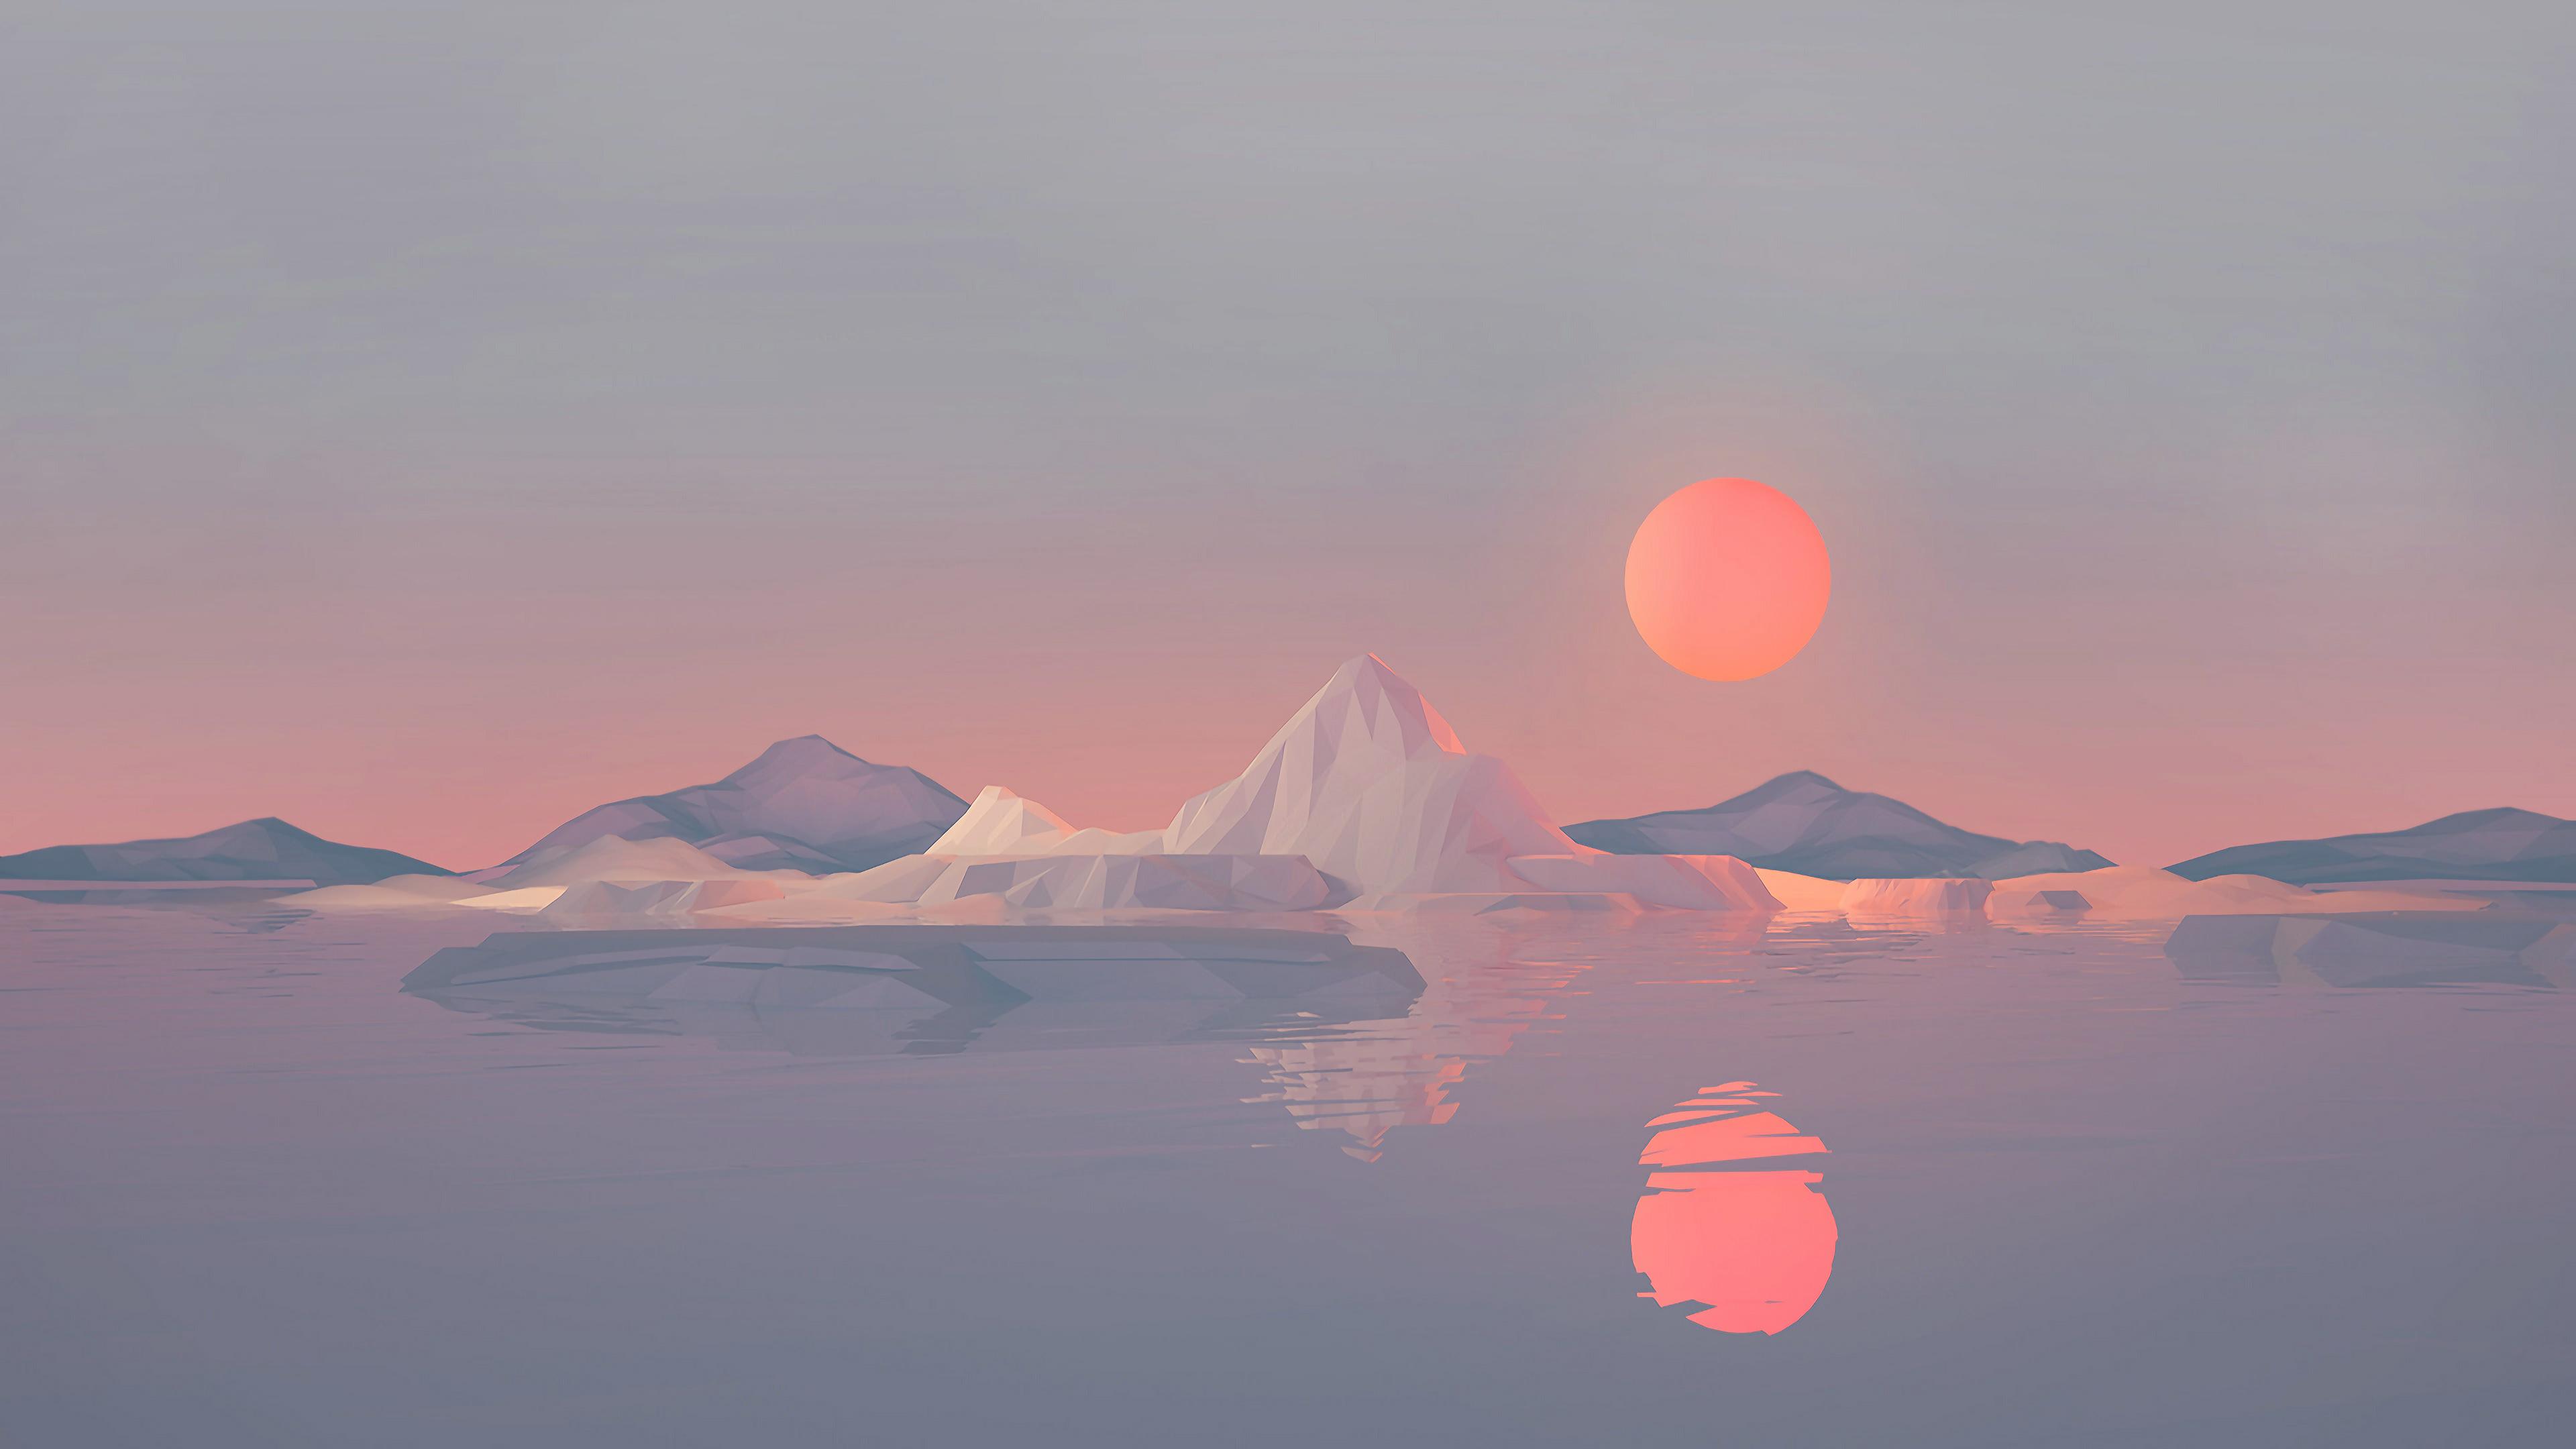 Recovery Mountain Minimalist 4k Hd Desktop Wallpaper For: Iceberg Minimalist 4k, HD Artist, 4k Wallpapers, Images